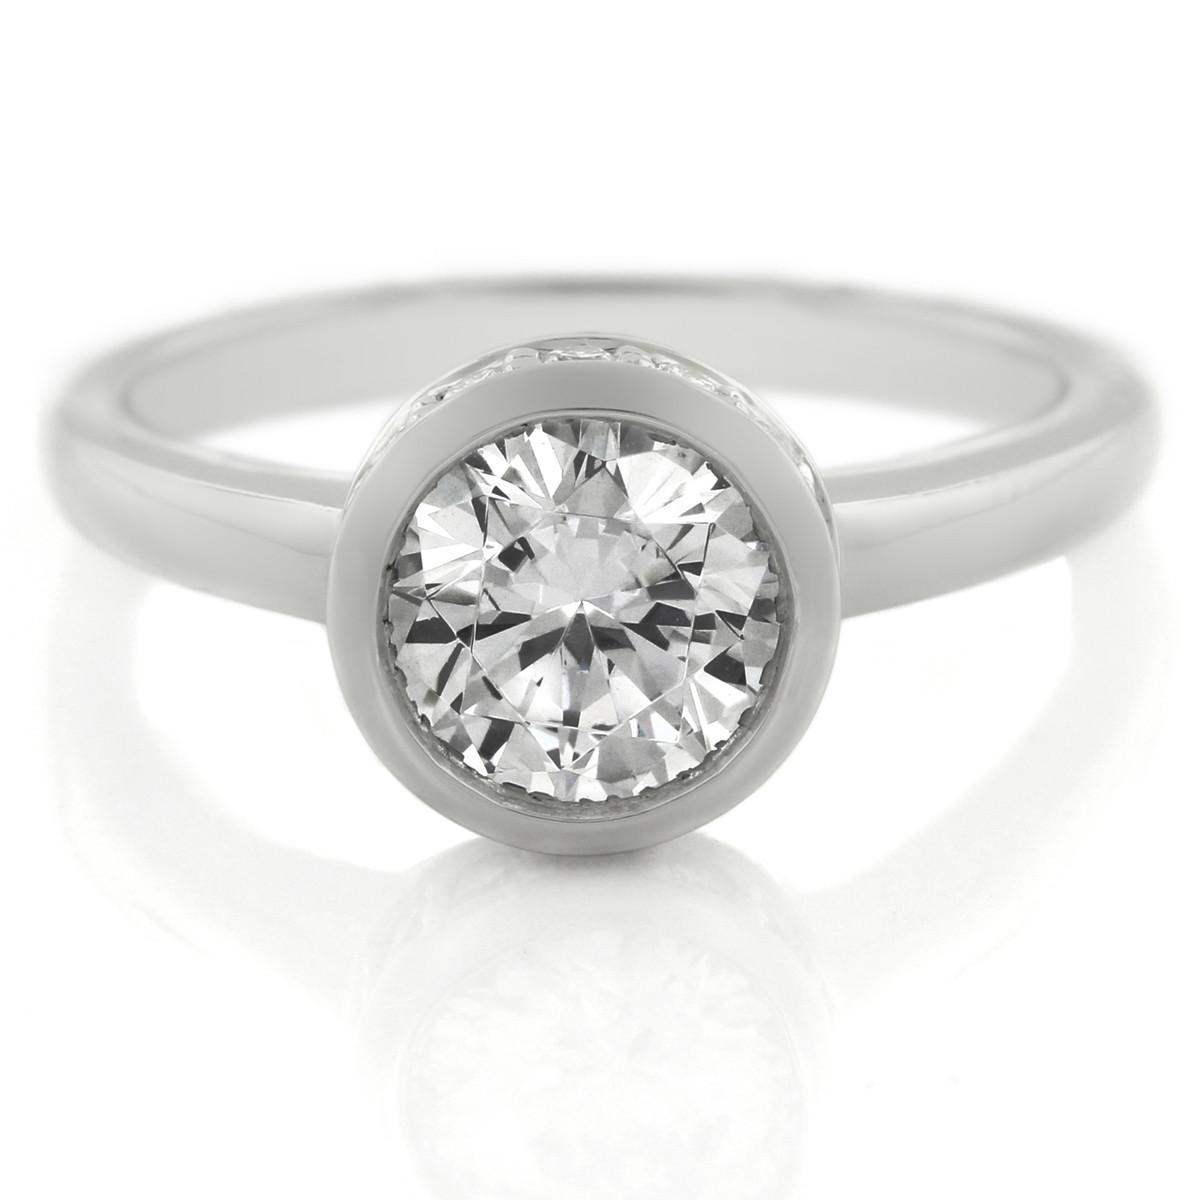 Platinum Bezel Set Diamond Engagement Ring by A. Jaffe